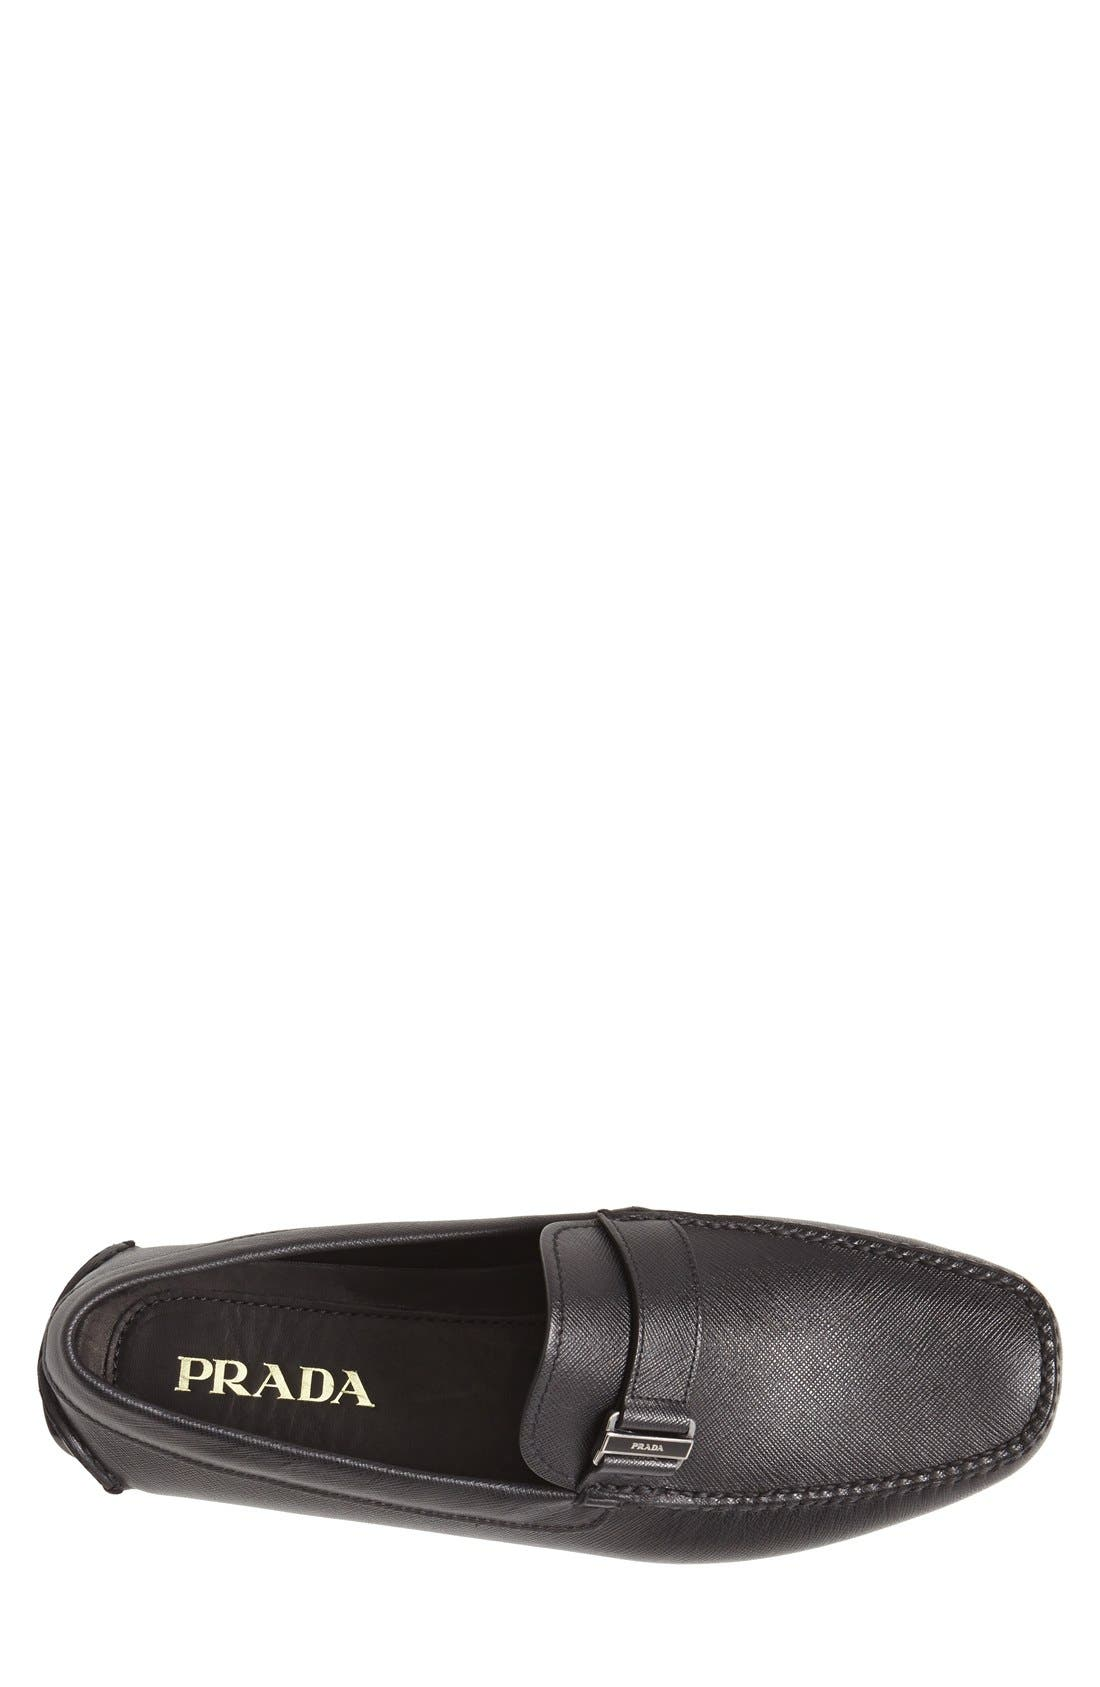 Alternate Image 3  - Prada Saffiano Leather Driving Shoe (Men)